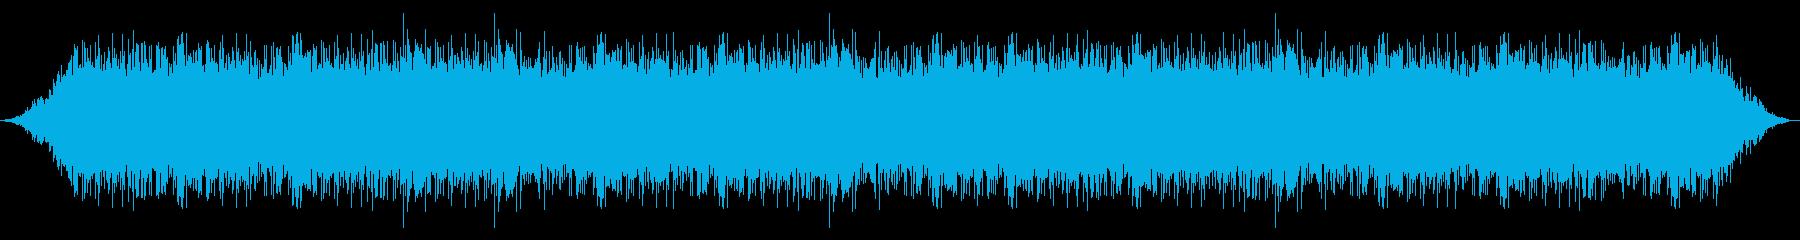 PC 駆動音01-06(ロング)の再生済みの波形